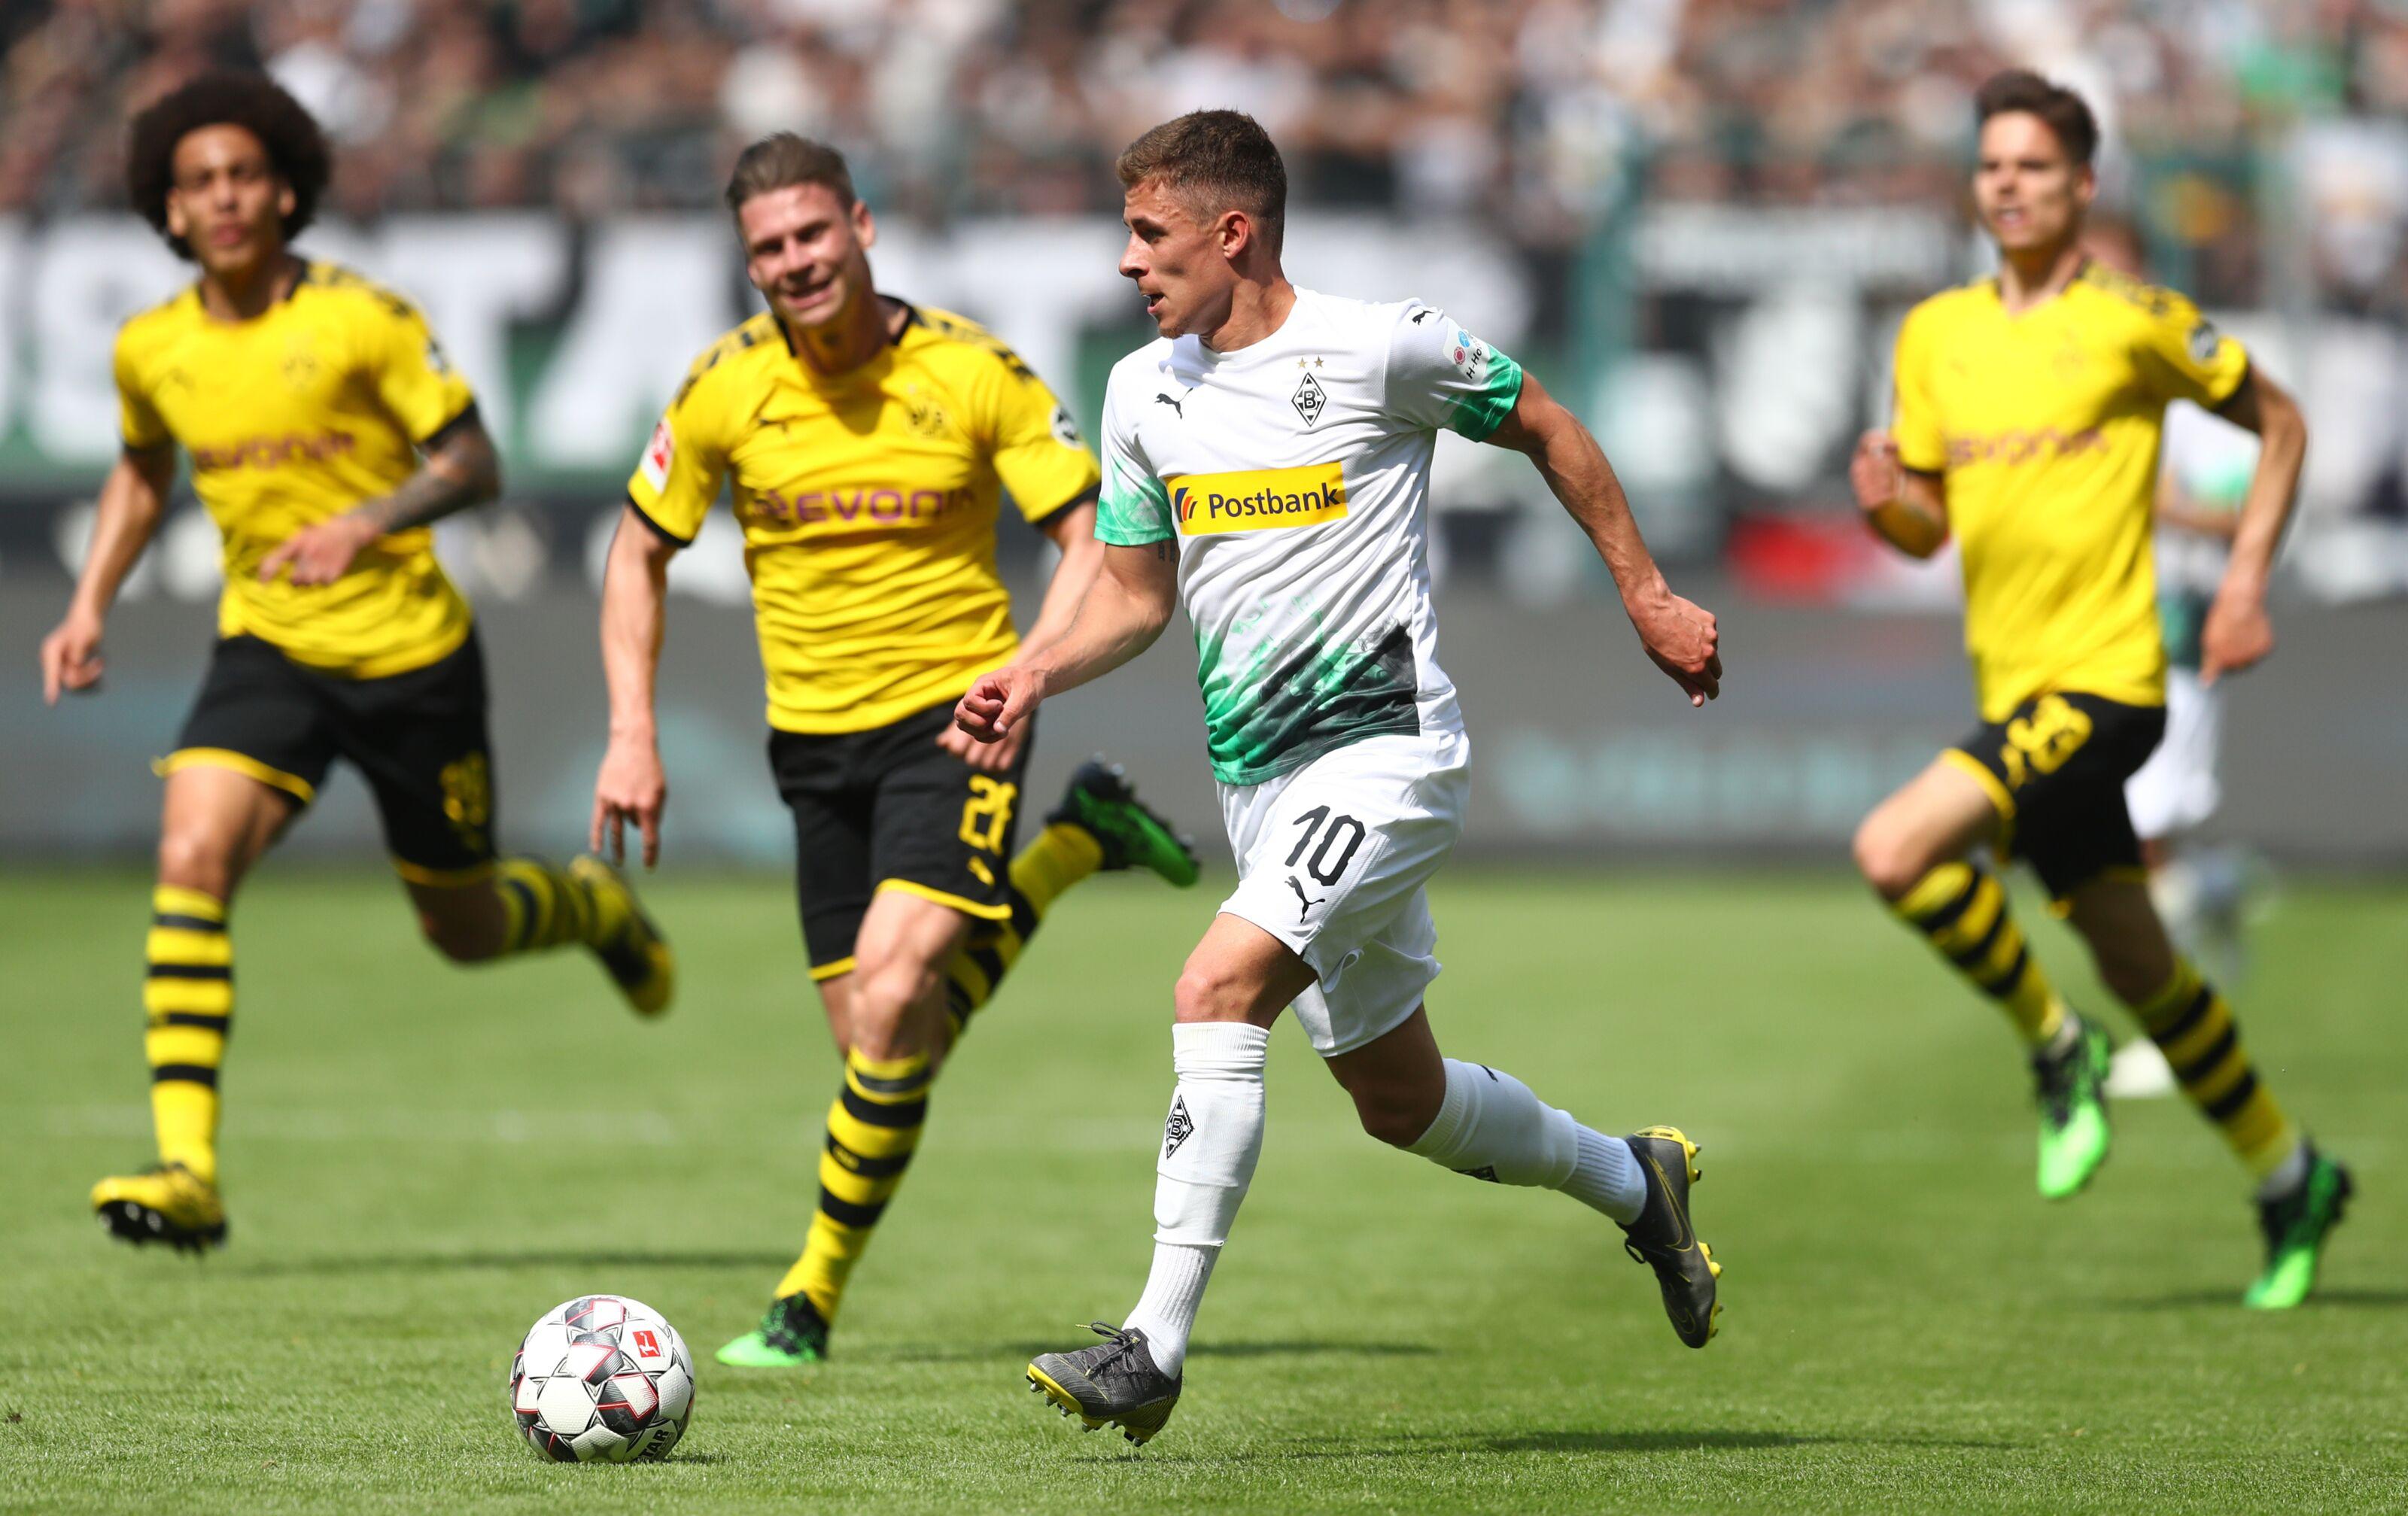 Scout report on new Borussia Dortmund signing Thorgan Hazard